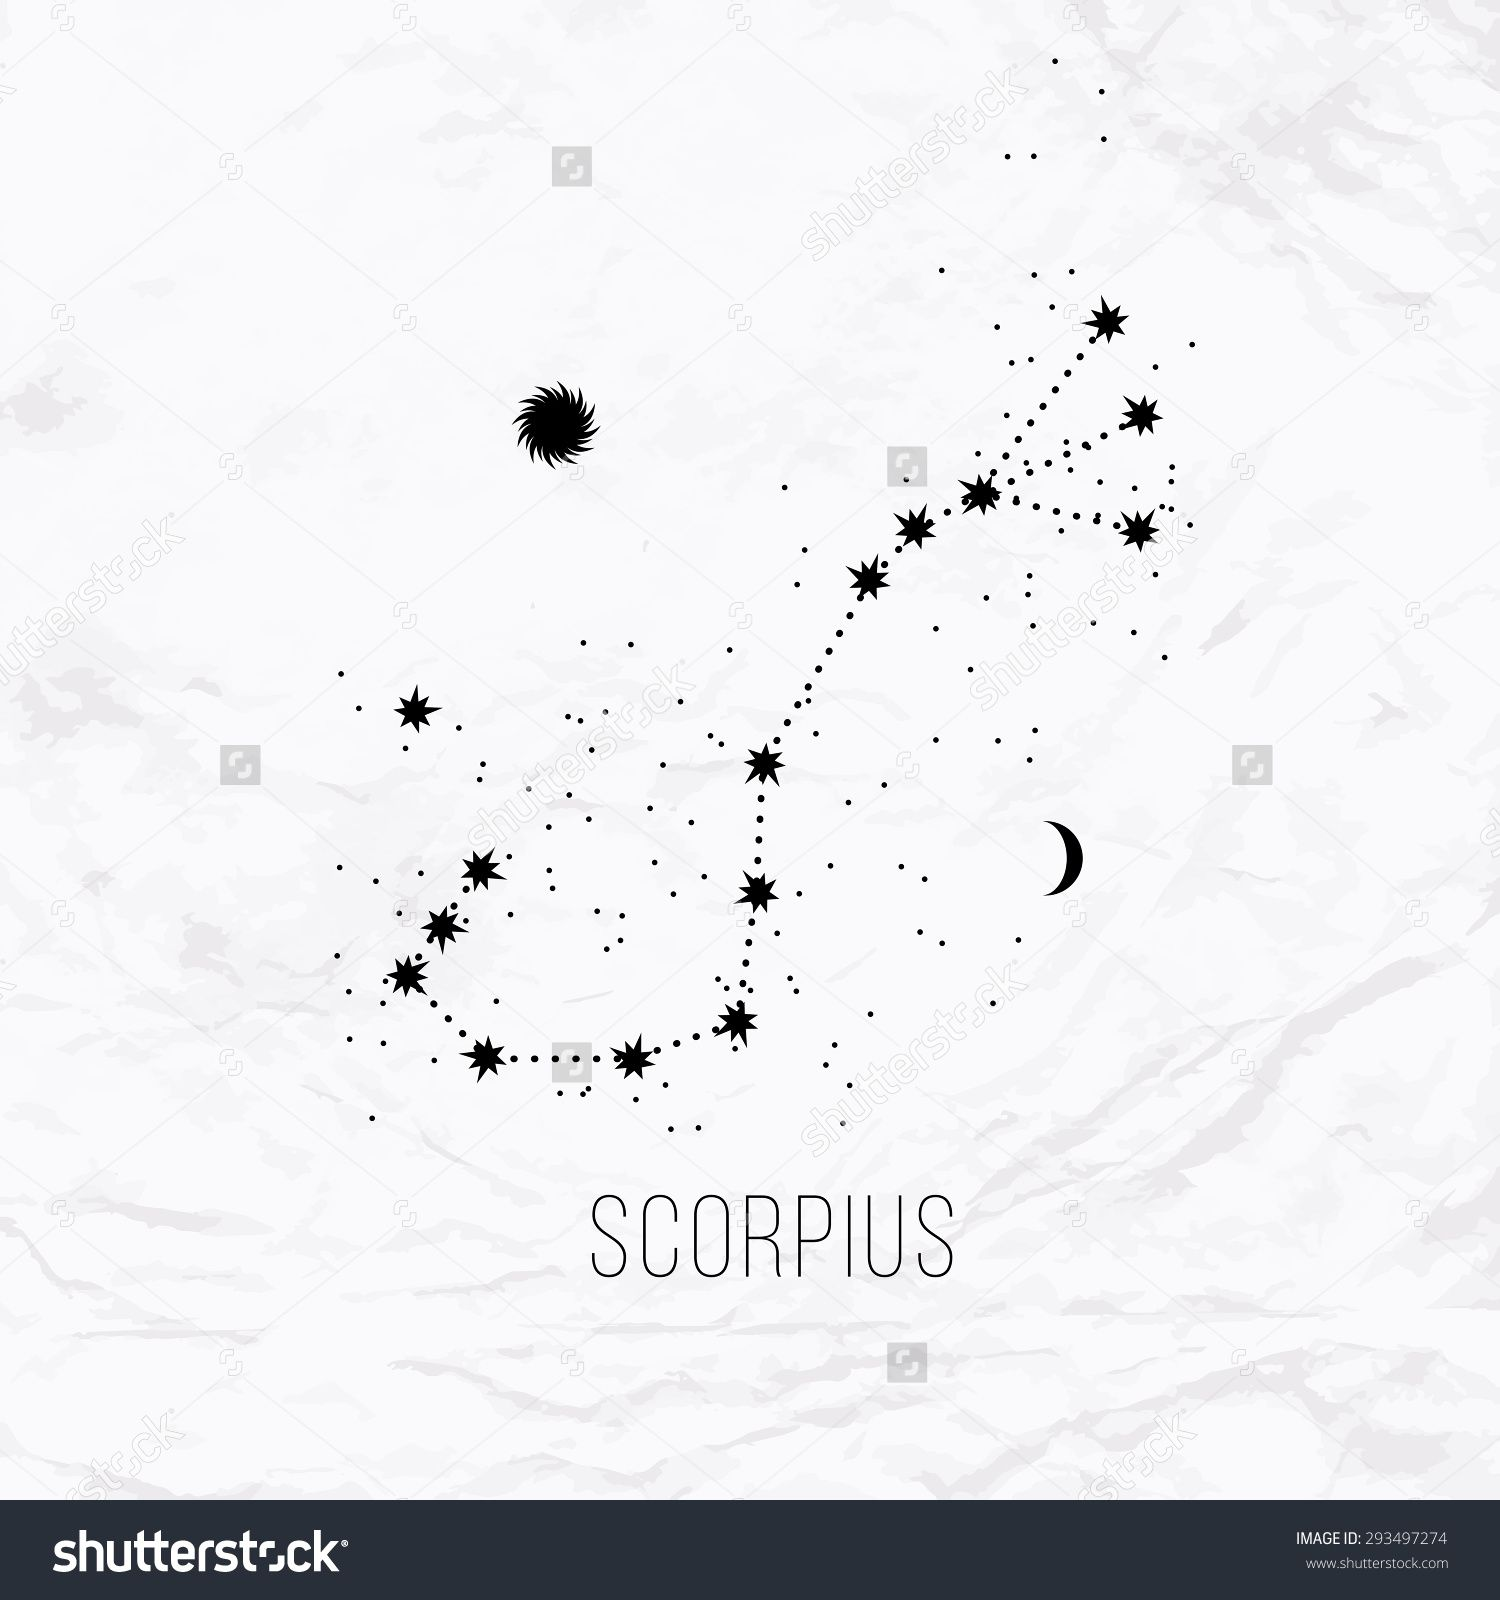 tattoo scorpion constellation google search tatoo pinterest tatouages id e tatouage et. Black Bedroom Furniture Sets. Home Design Ideas